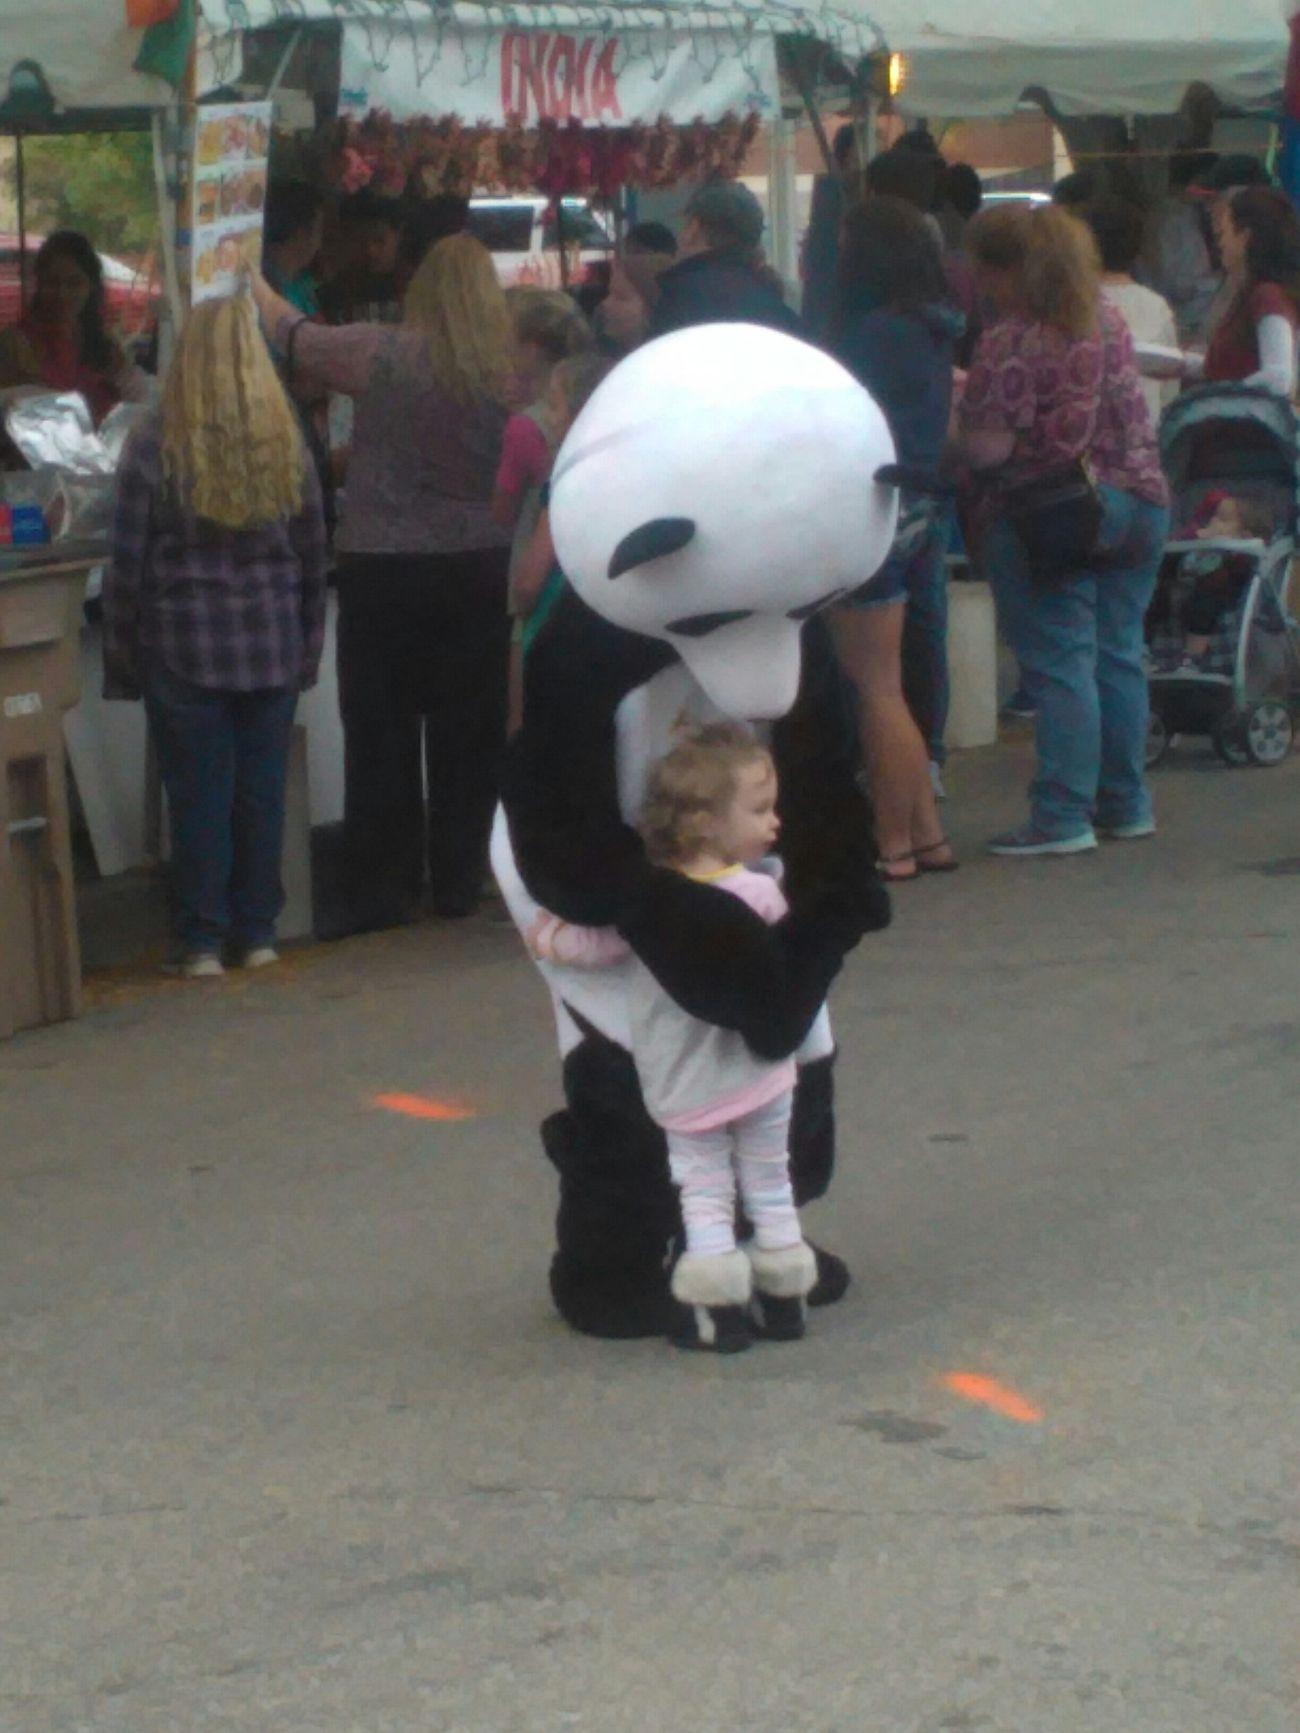 PANDA ♡♡ Panda Love Happy Kid! Ethnic Expo Taking Photos